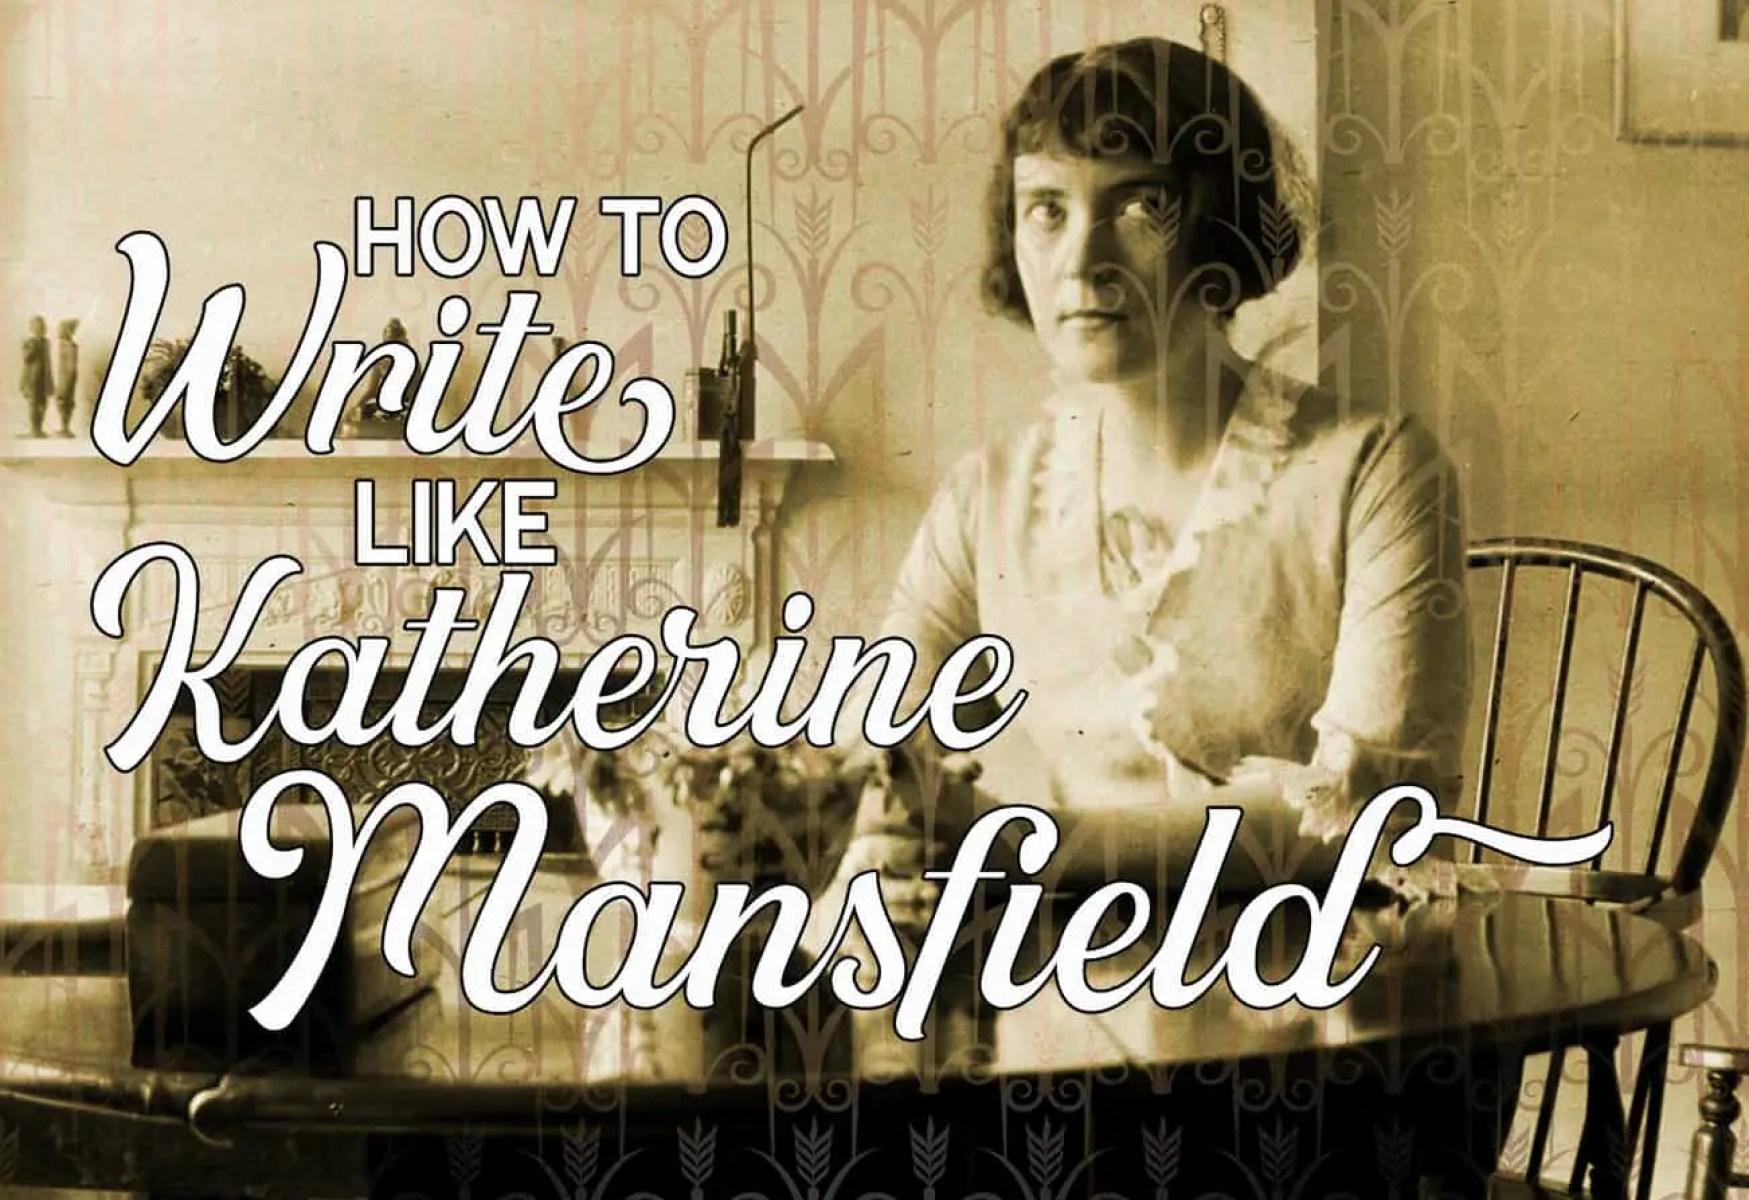 How To Write Like Katherine Mansfield